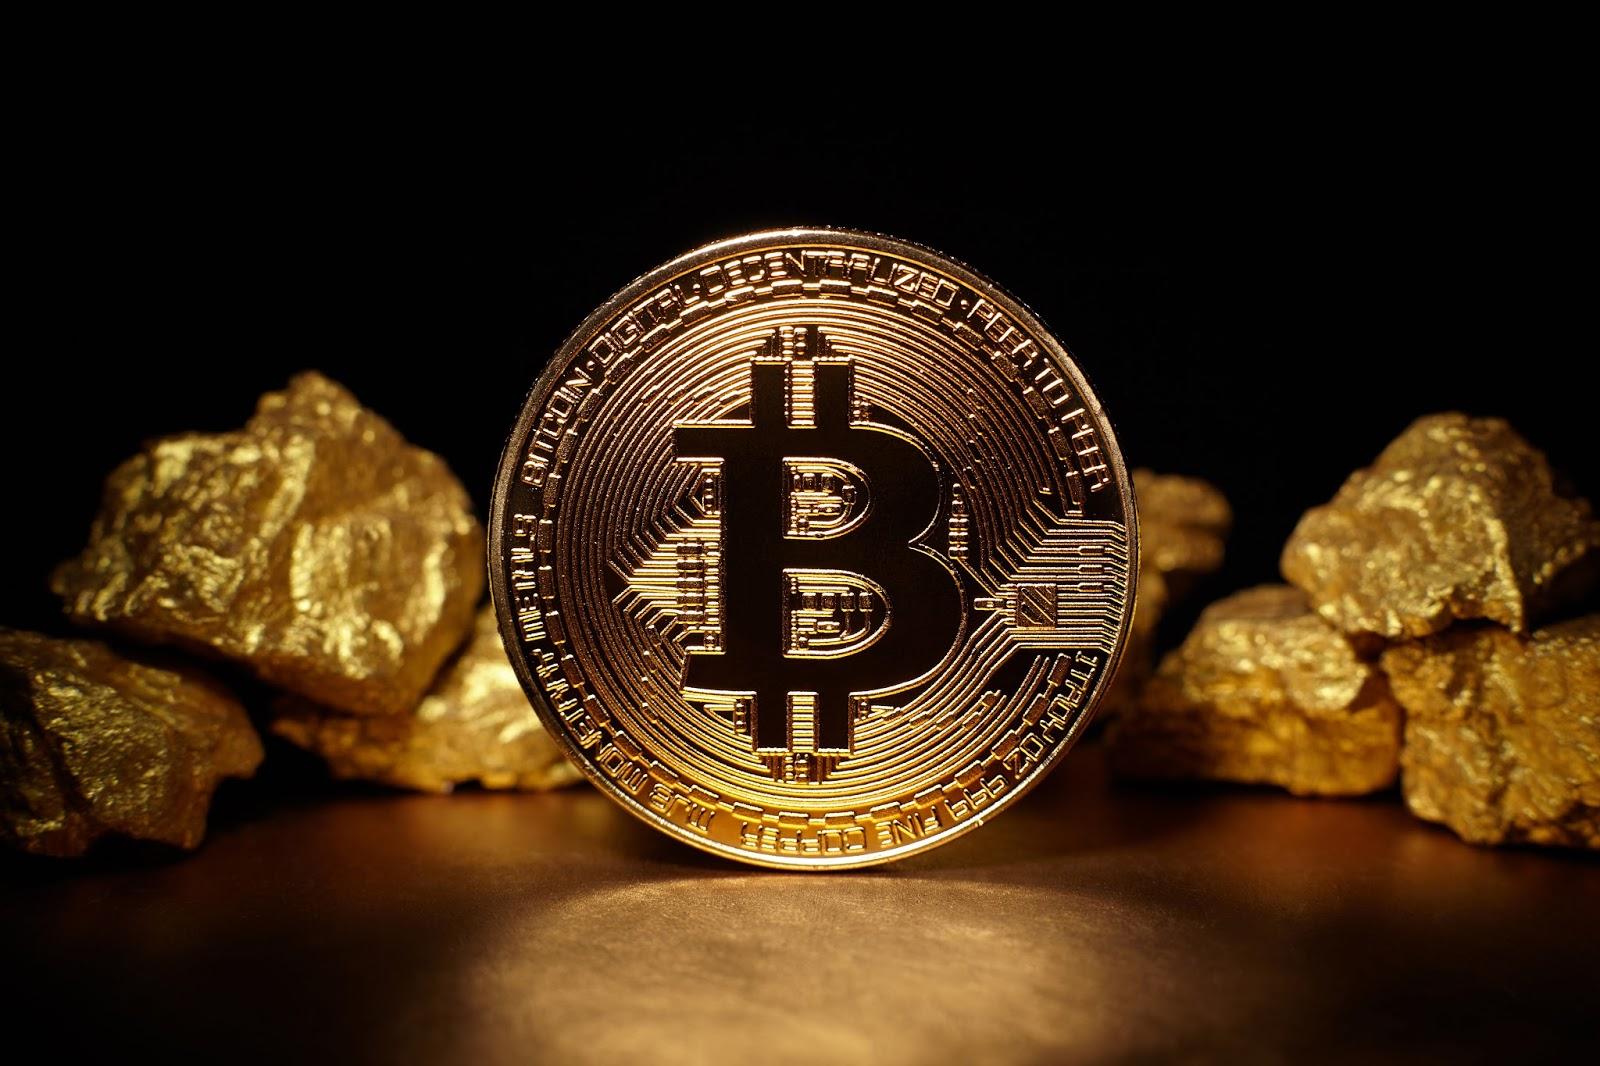 I got rich off bitcoins to dollars national tv awards betting calculator